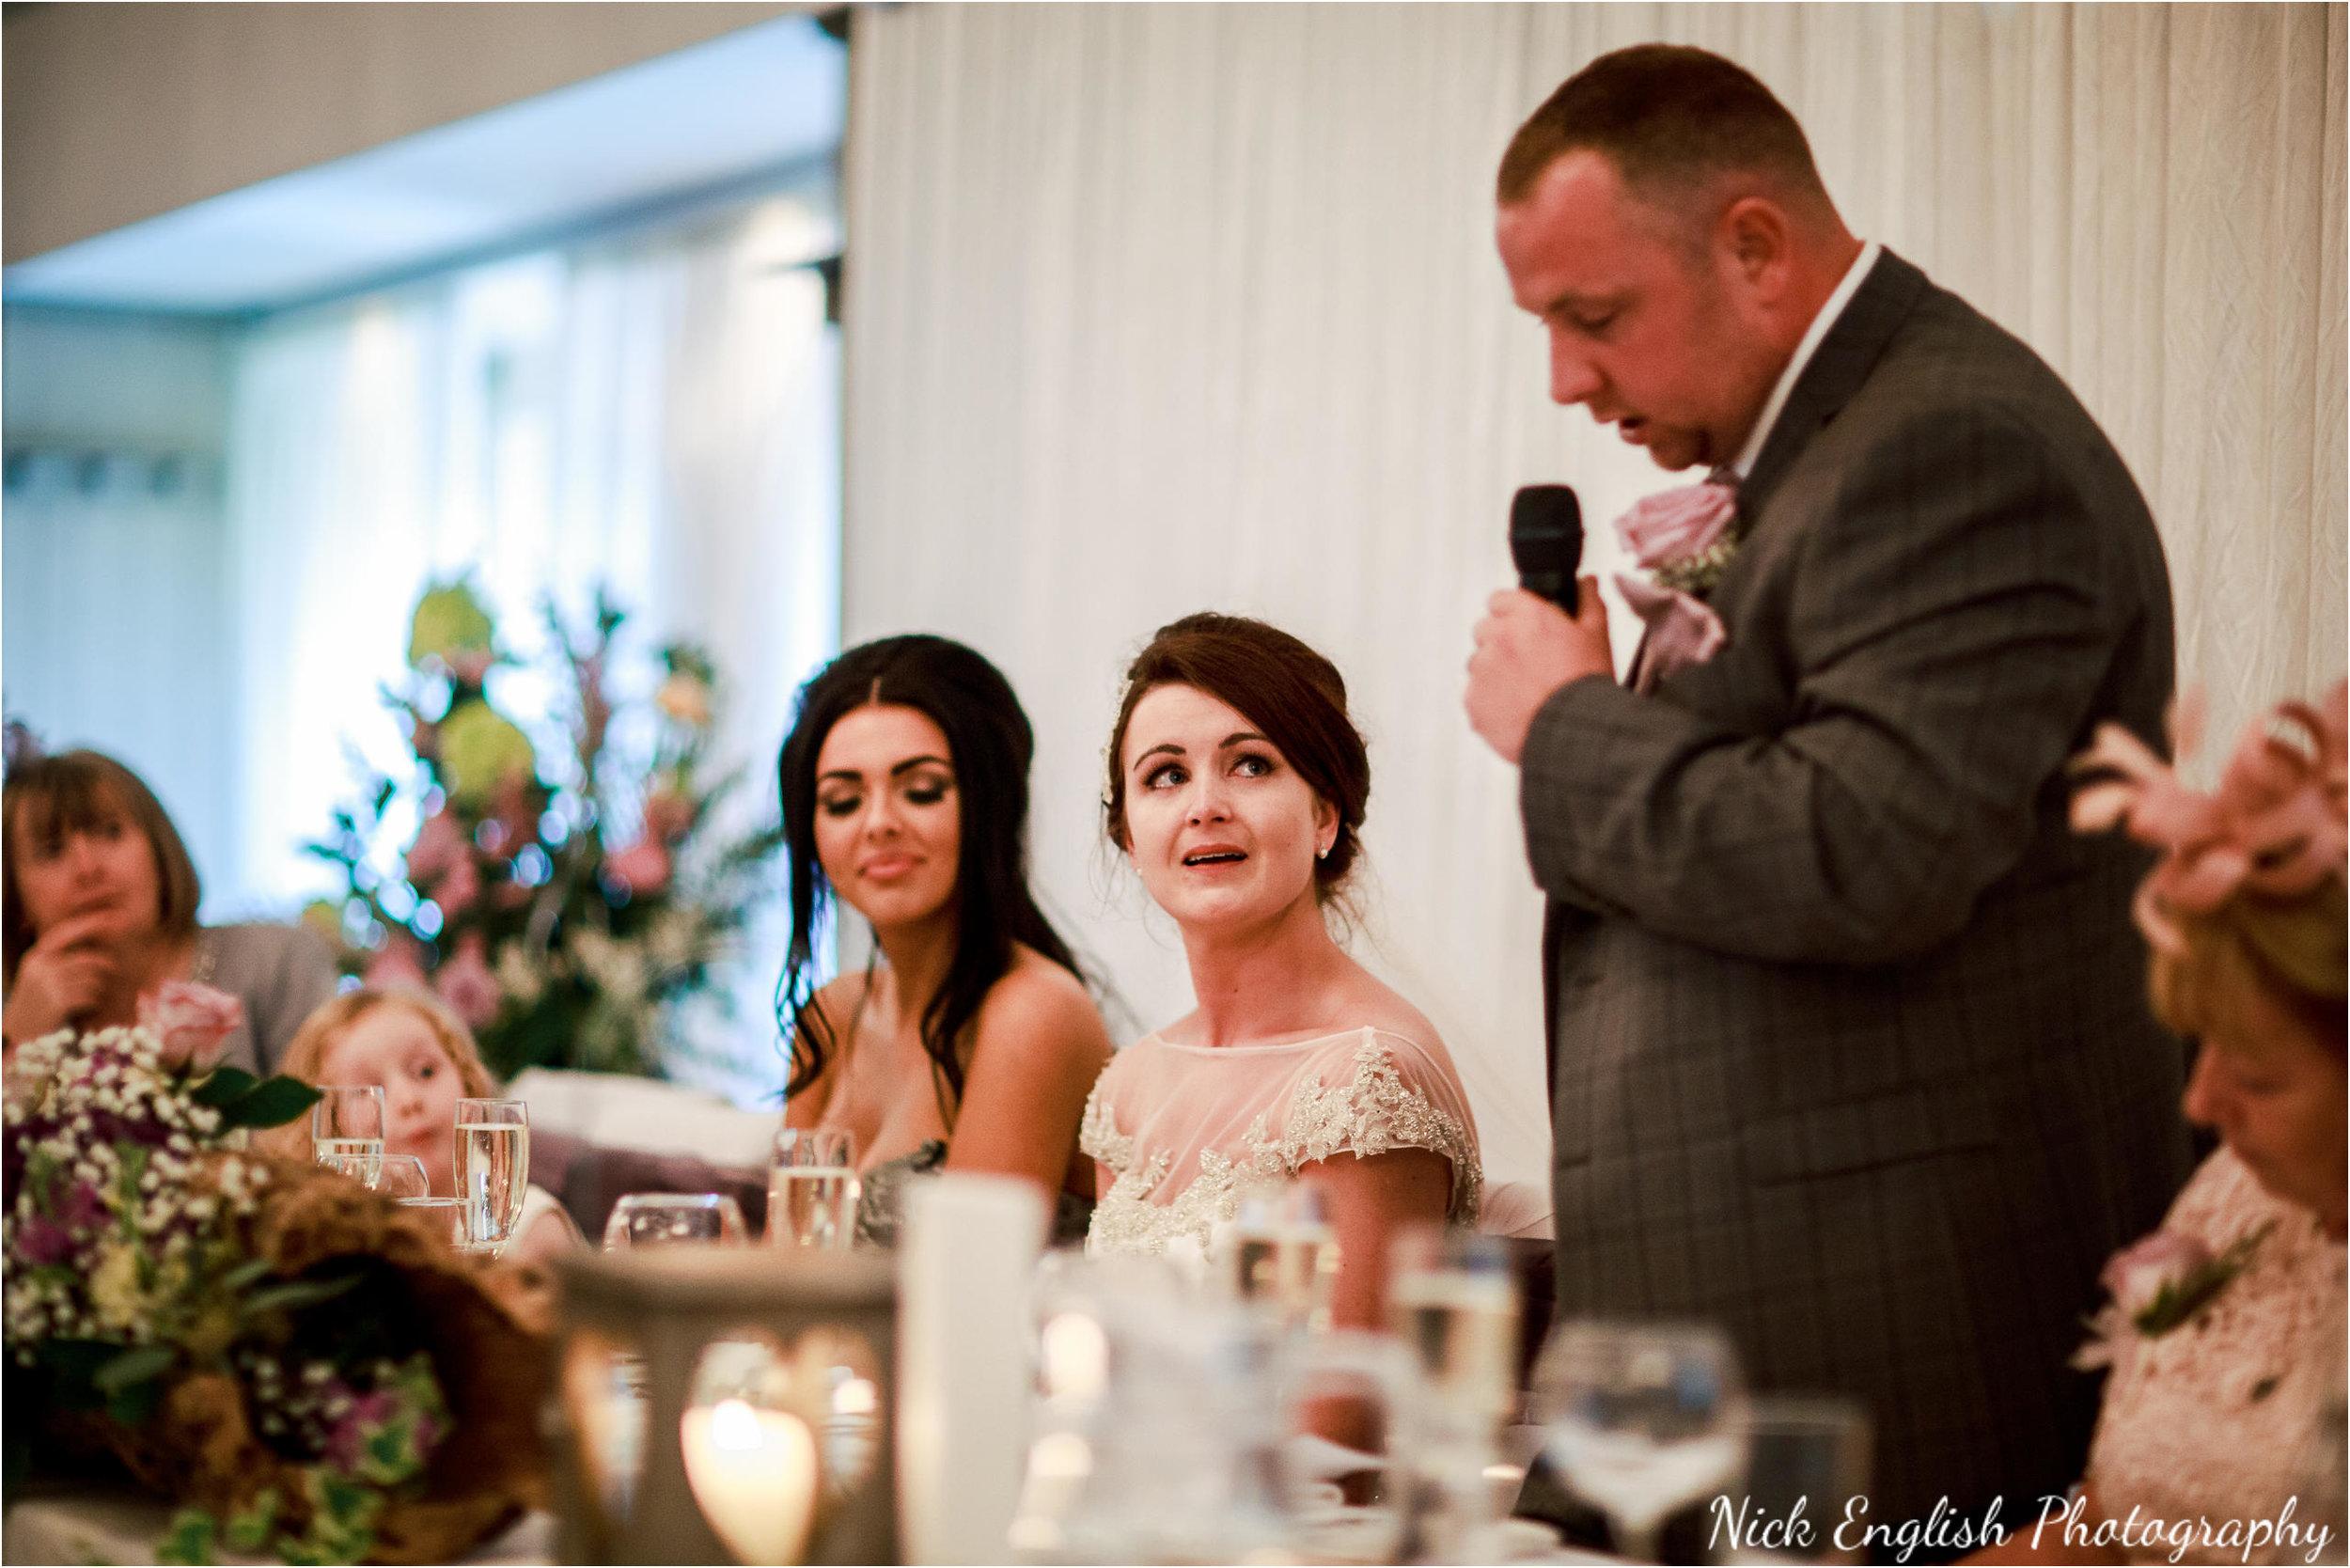 Stacey-Ash-Wedding-Photographs-Stanley-House-Preston-Lancashire-169.jpg